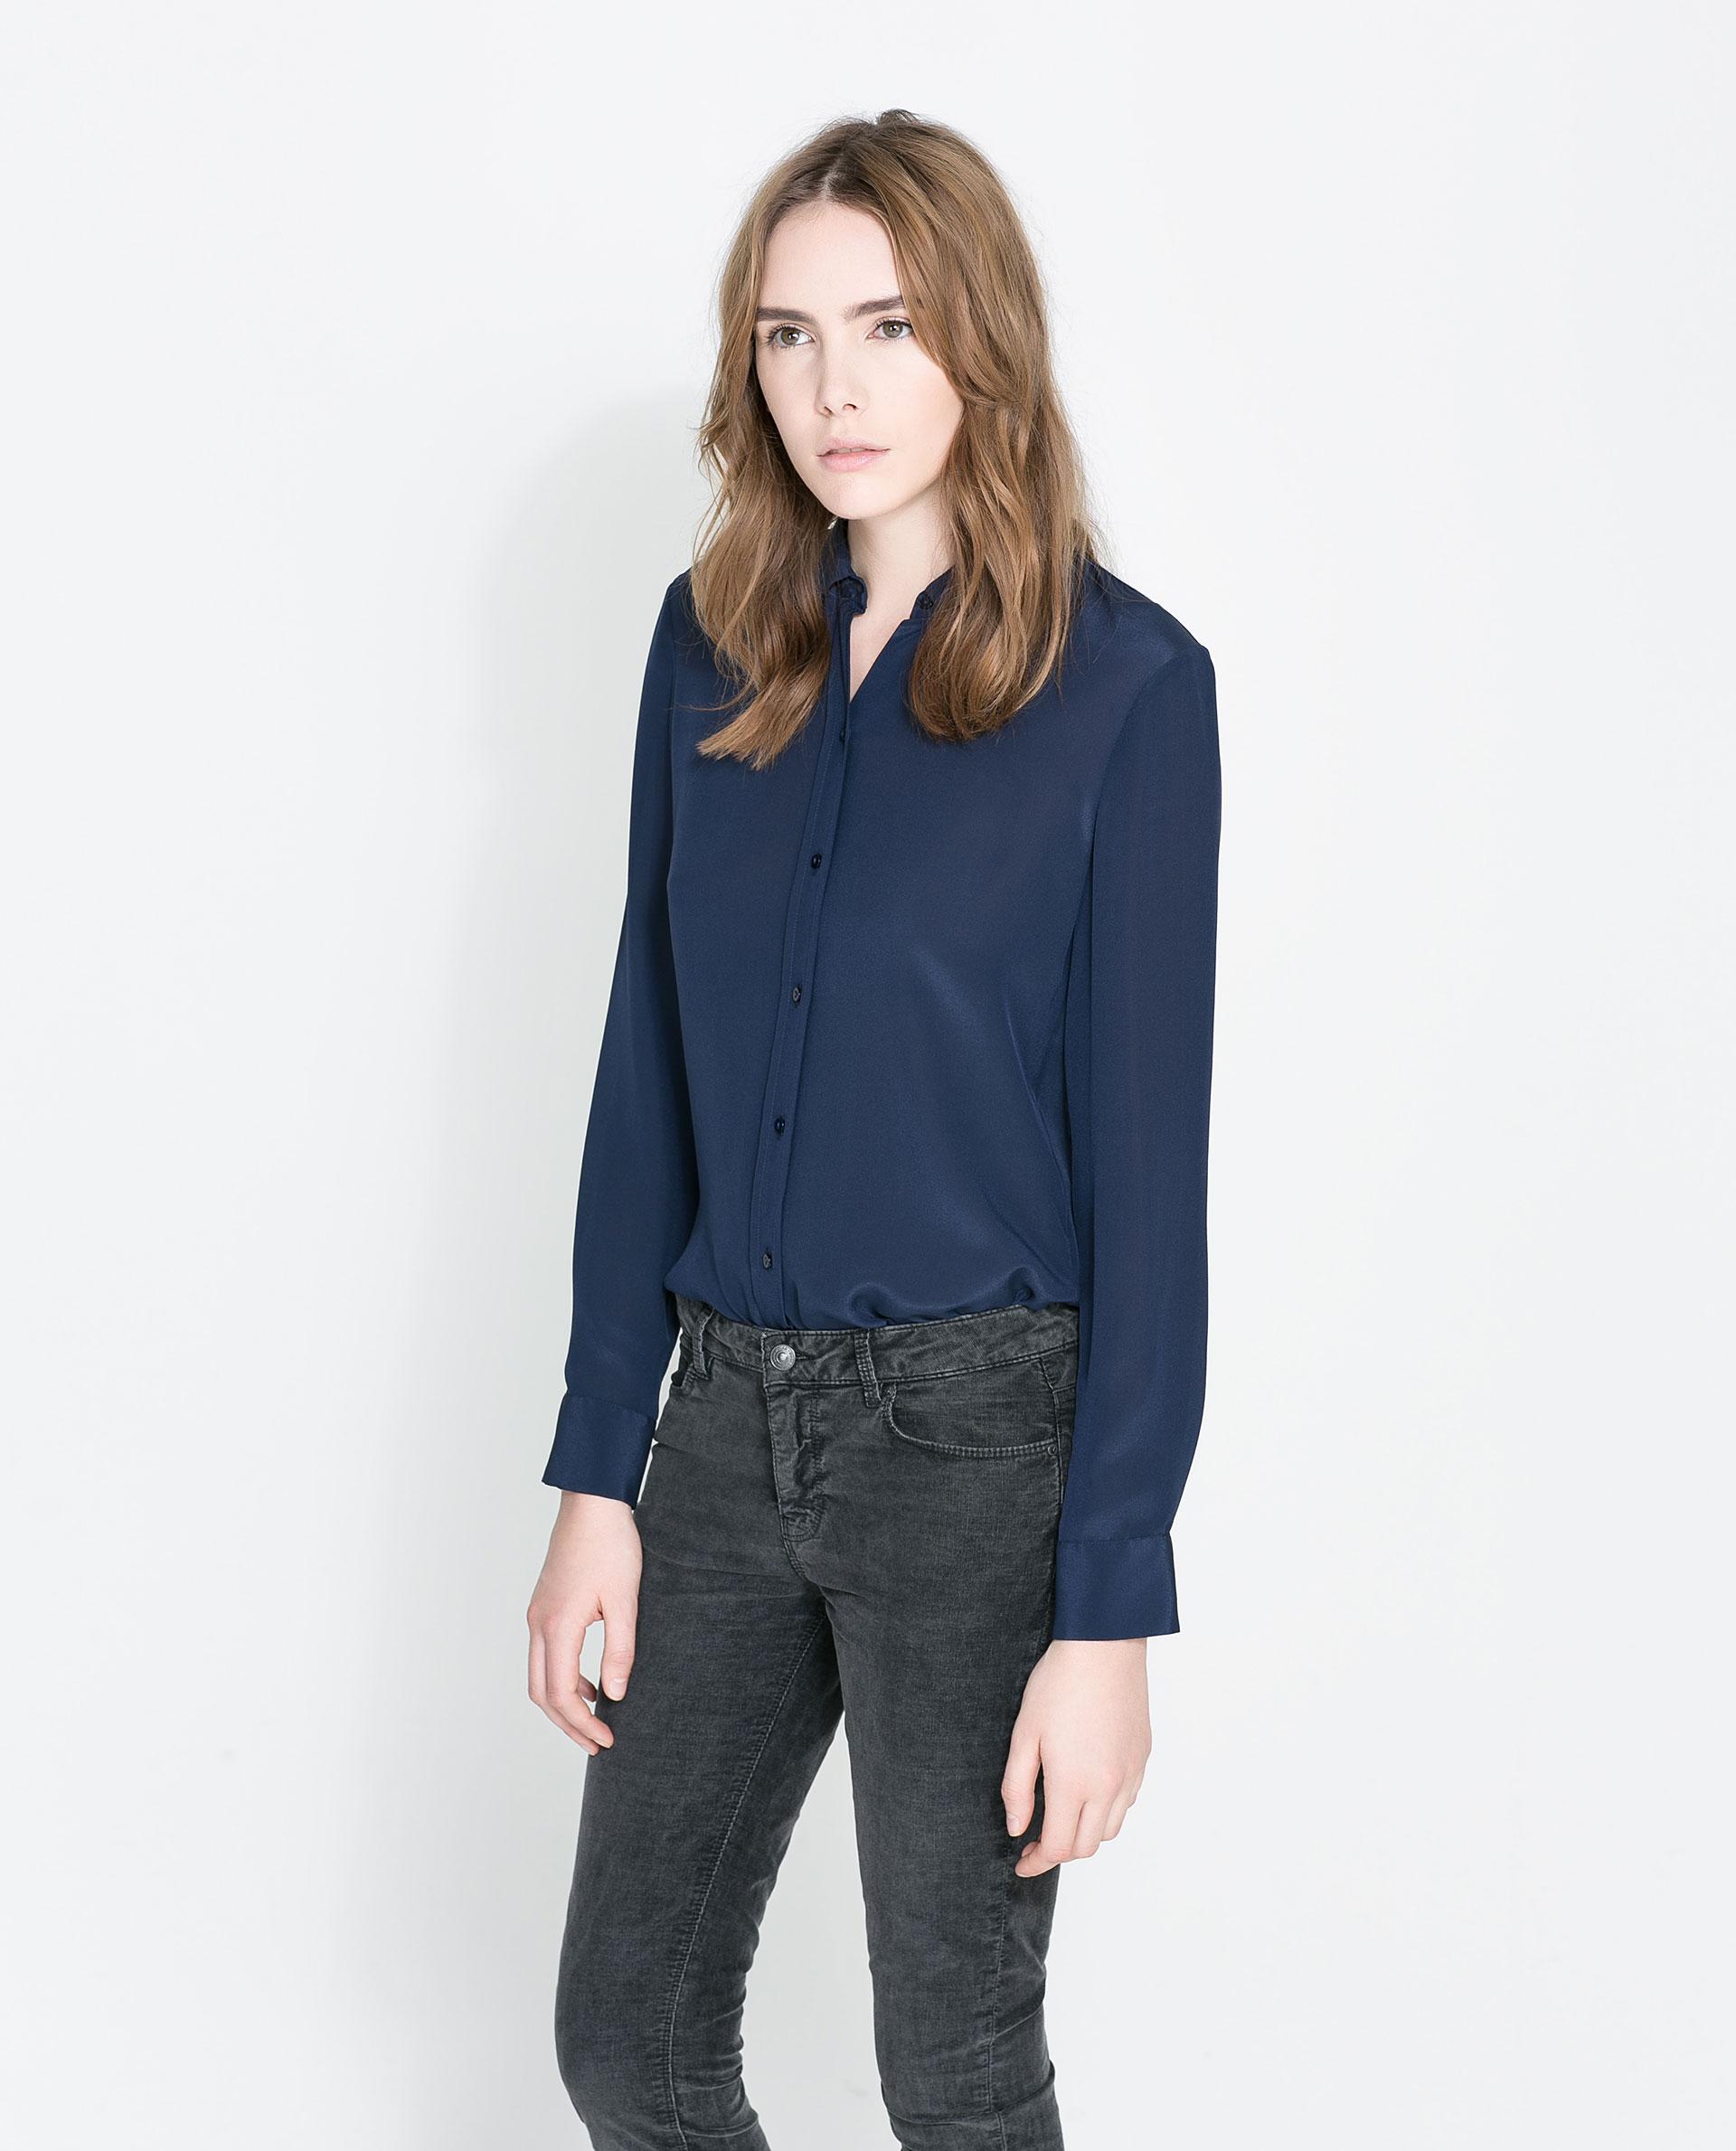 Zara Silk Blouse 67